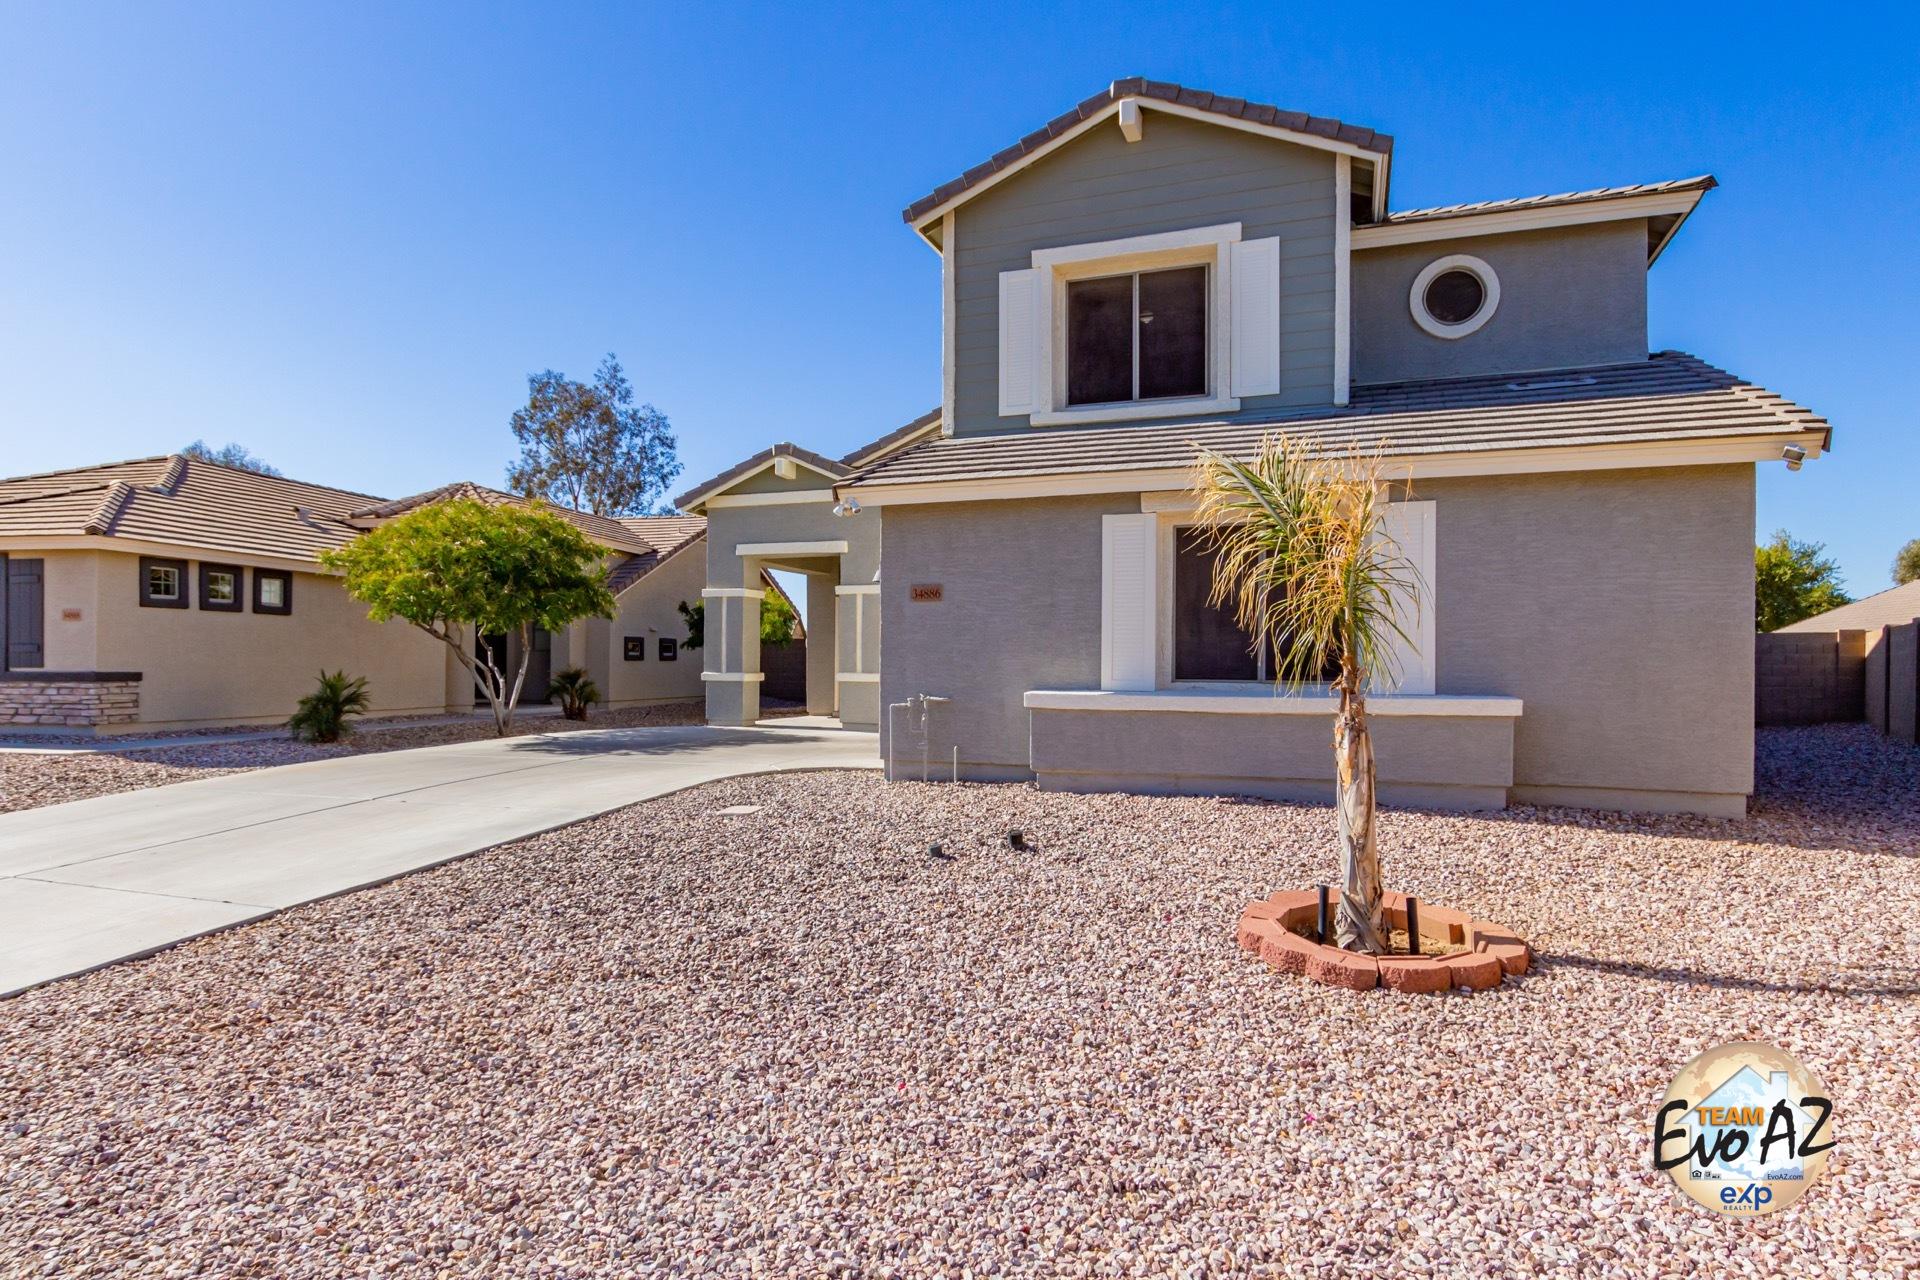 34886 N Stetson Ct,Queen Creek, AZ 85142